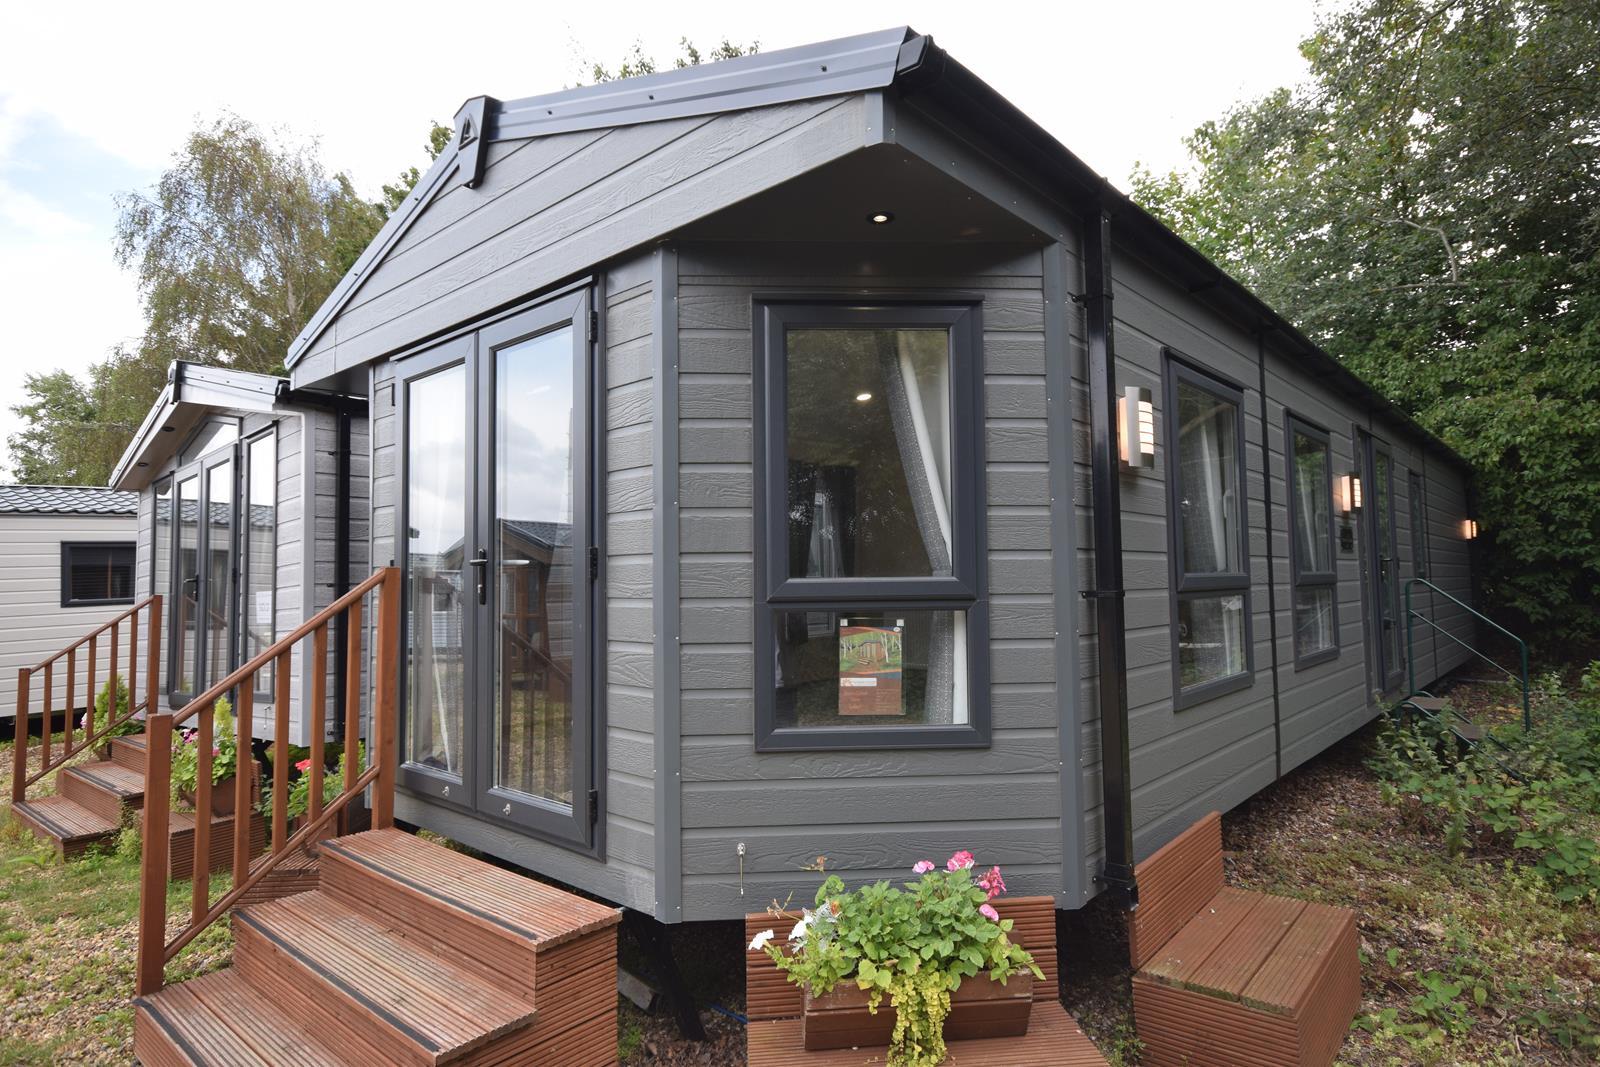 Sunrise Lodge Oaktree wheelchair friendly mobile home exterior